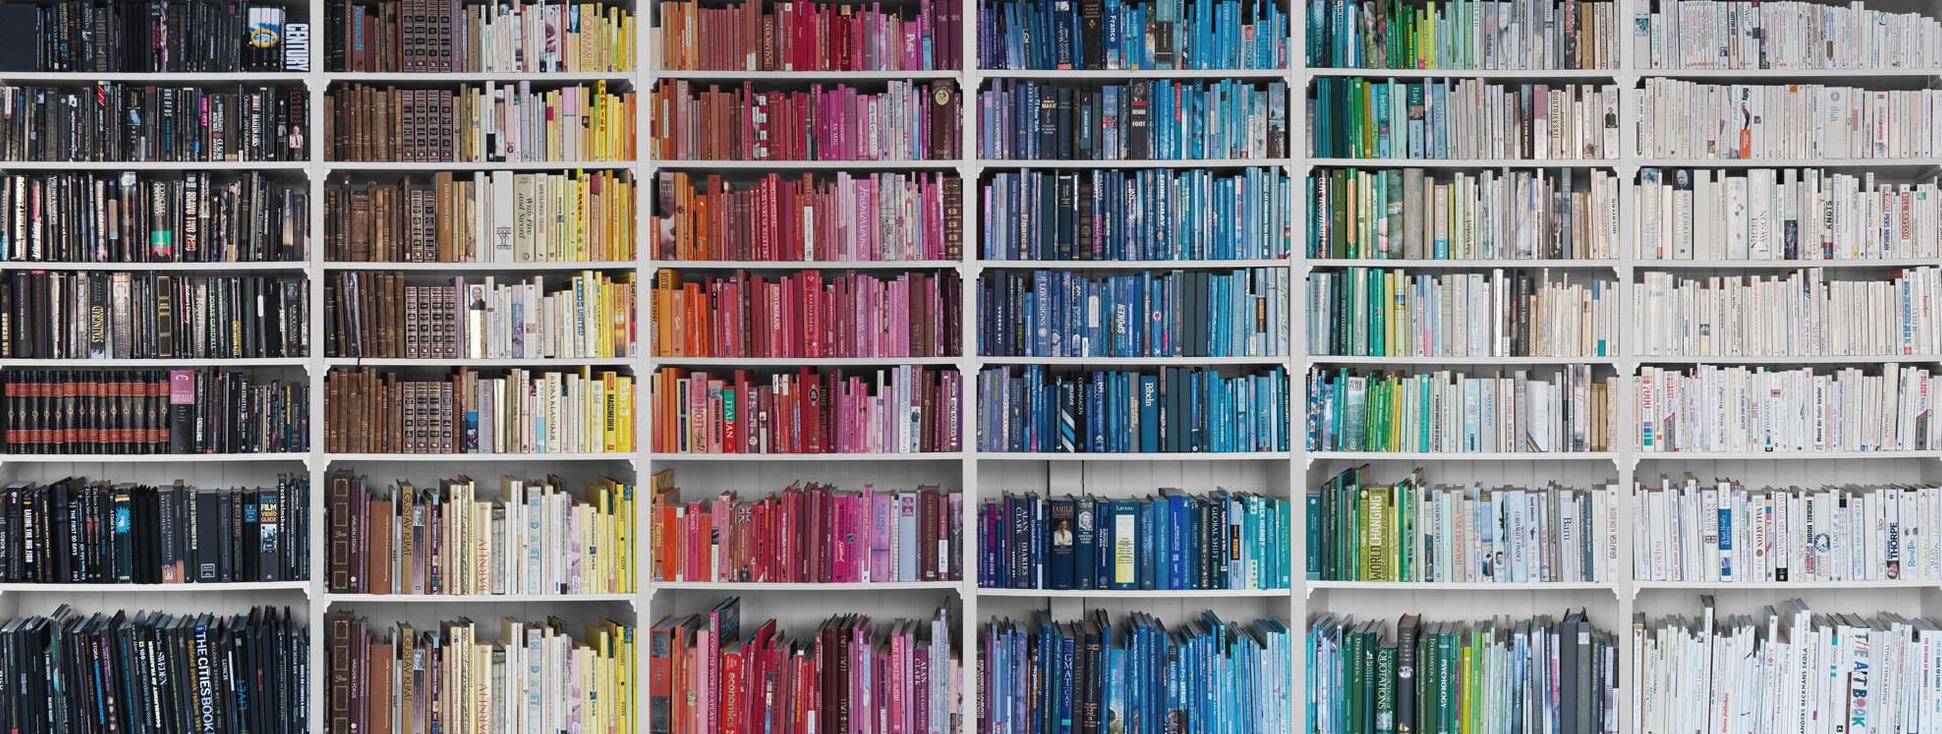 Download Book Wallpaper Widescreen Hd Wallpapers 1942x734 50